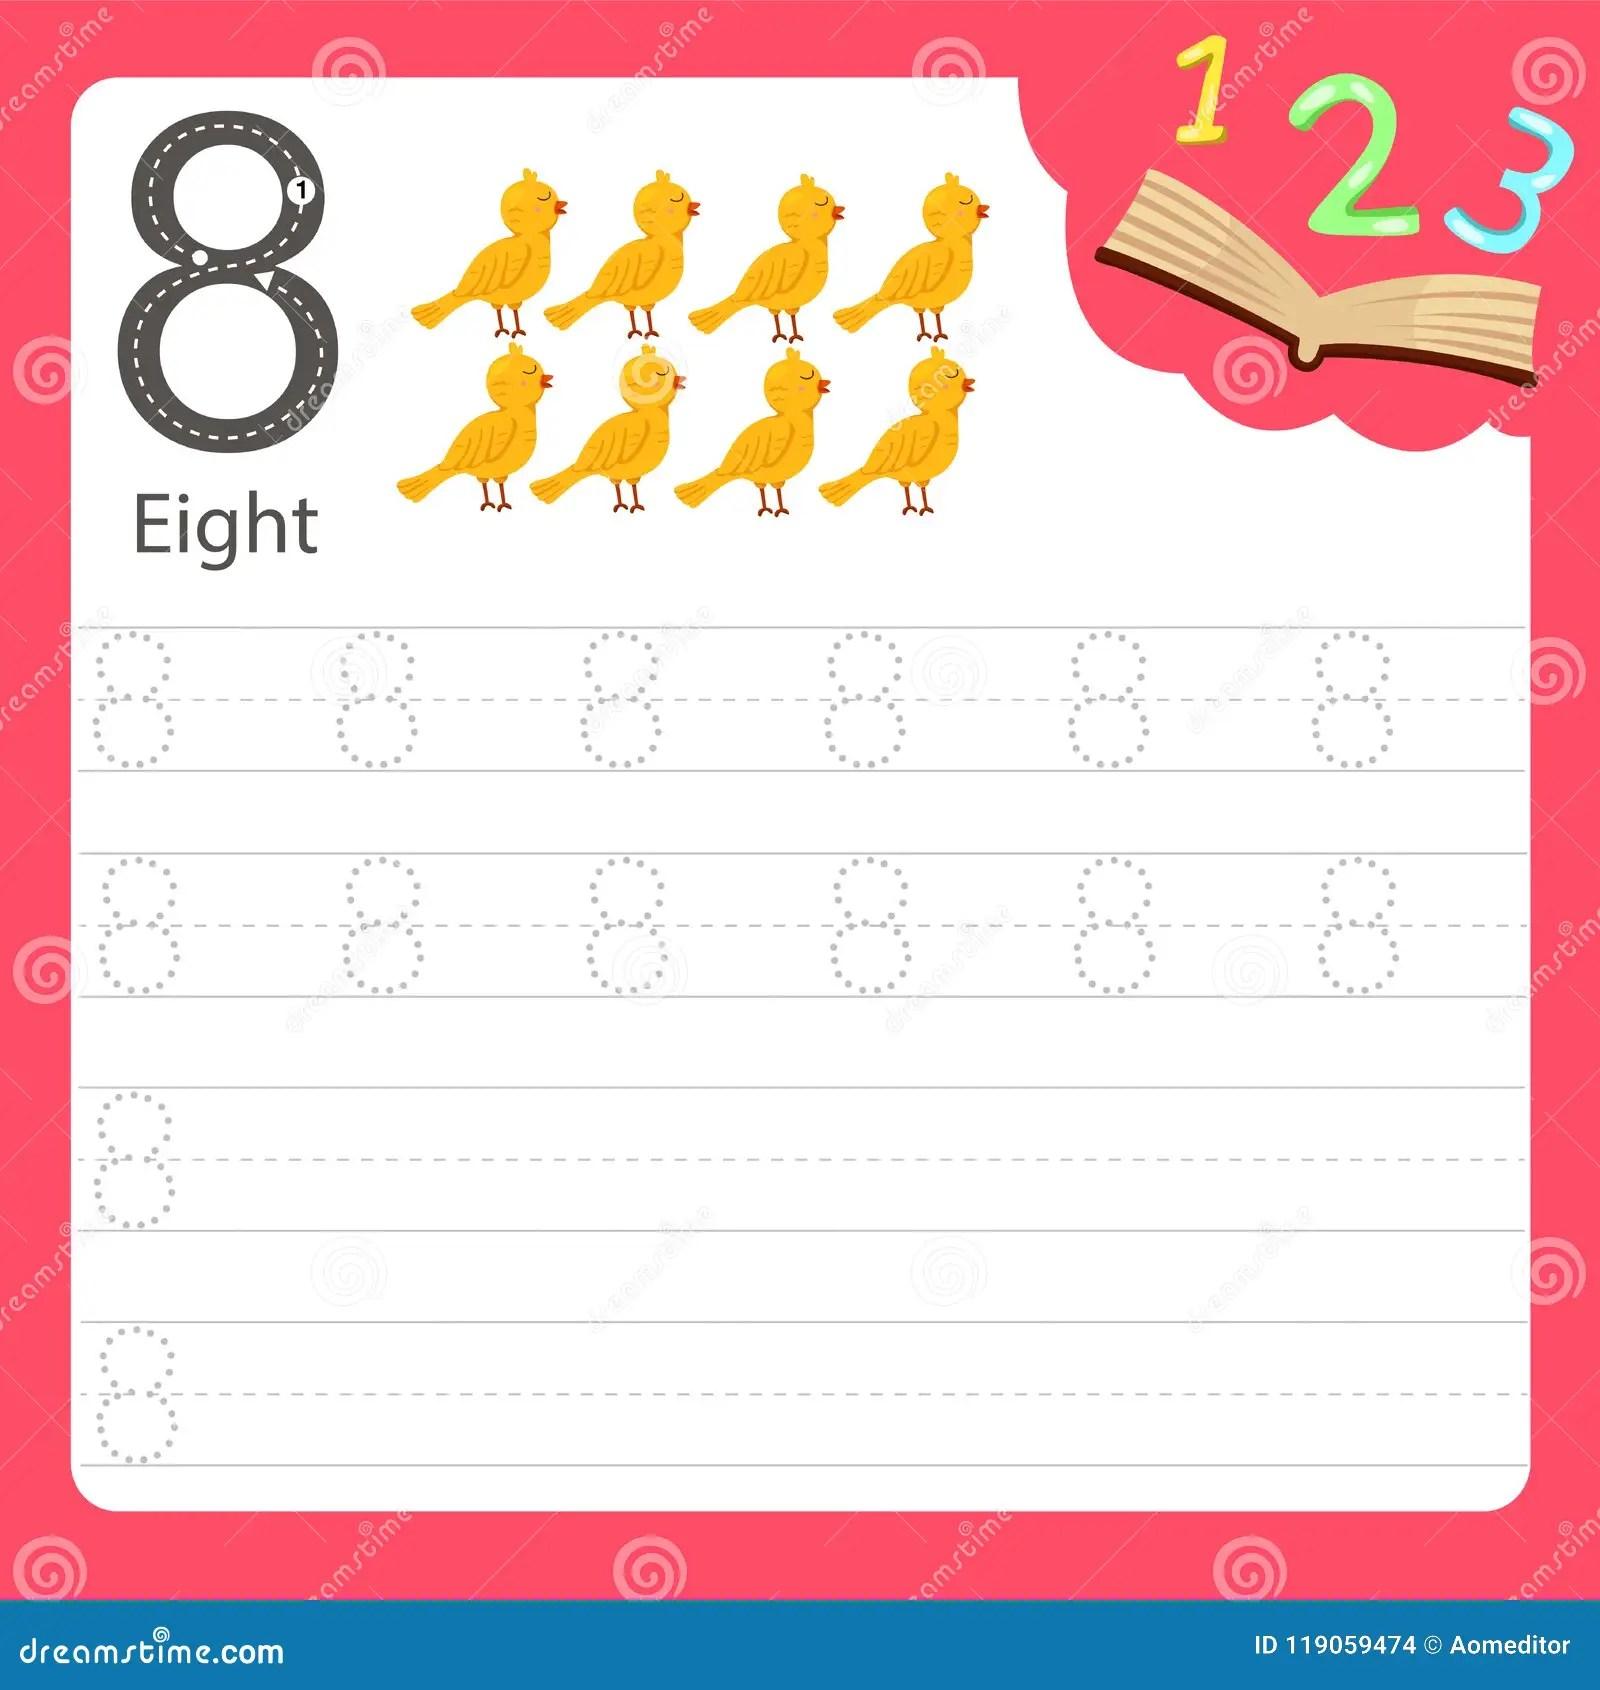 Worksheet Writing Practice Number Eight Stock Vector